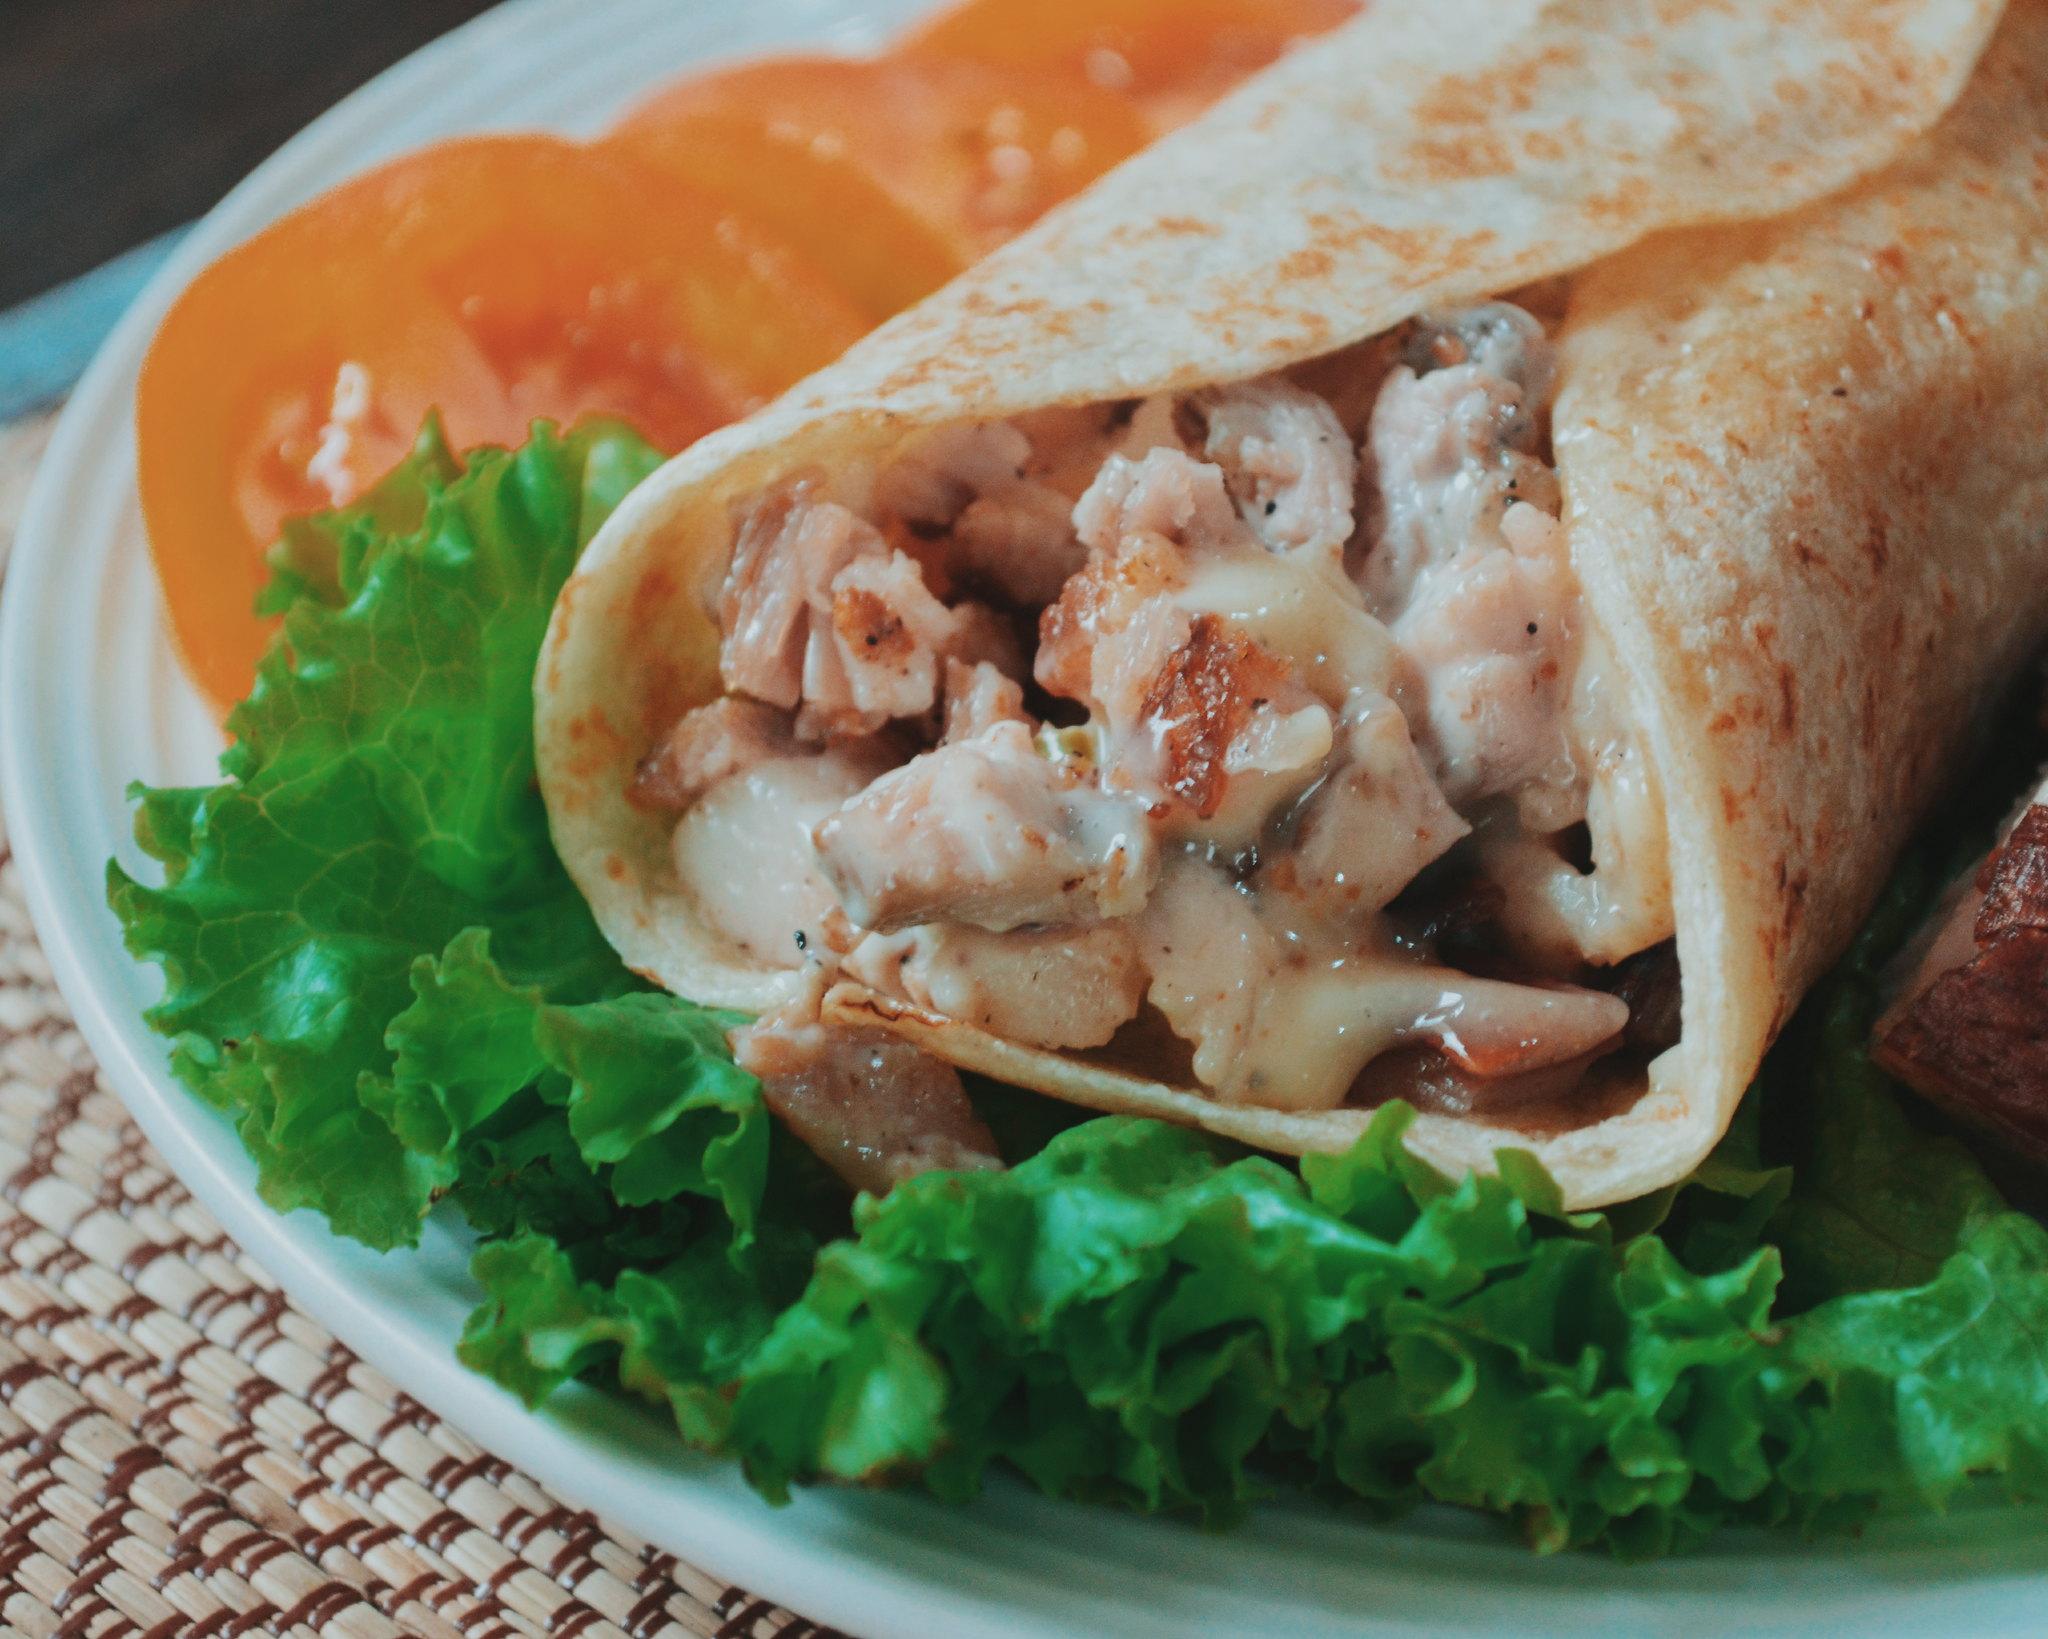 Porky Pit Best Lechon Cebu in Manila